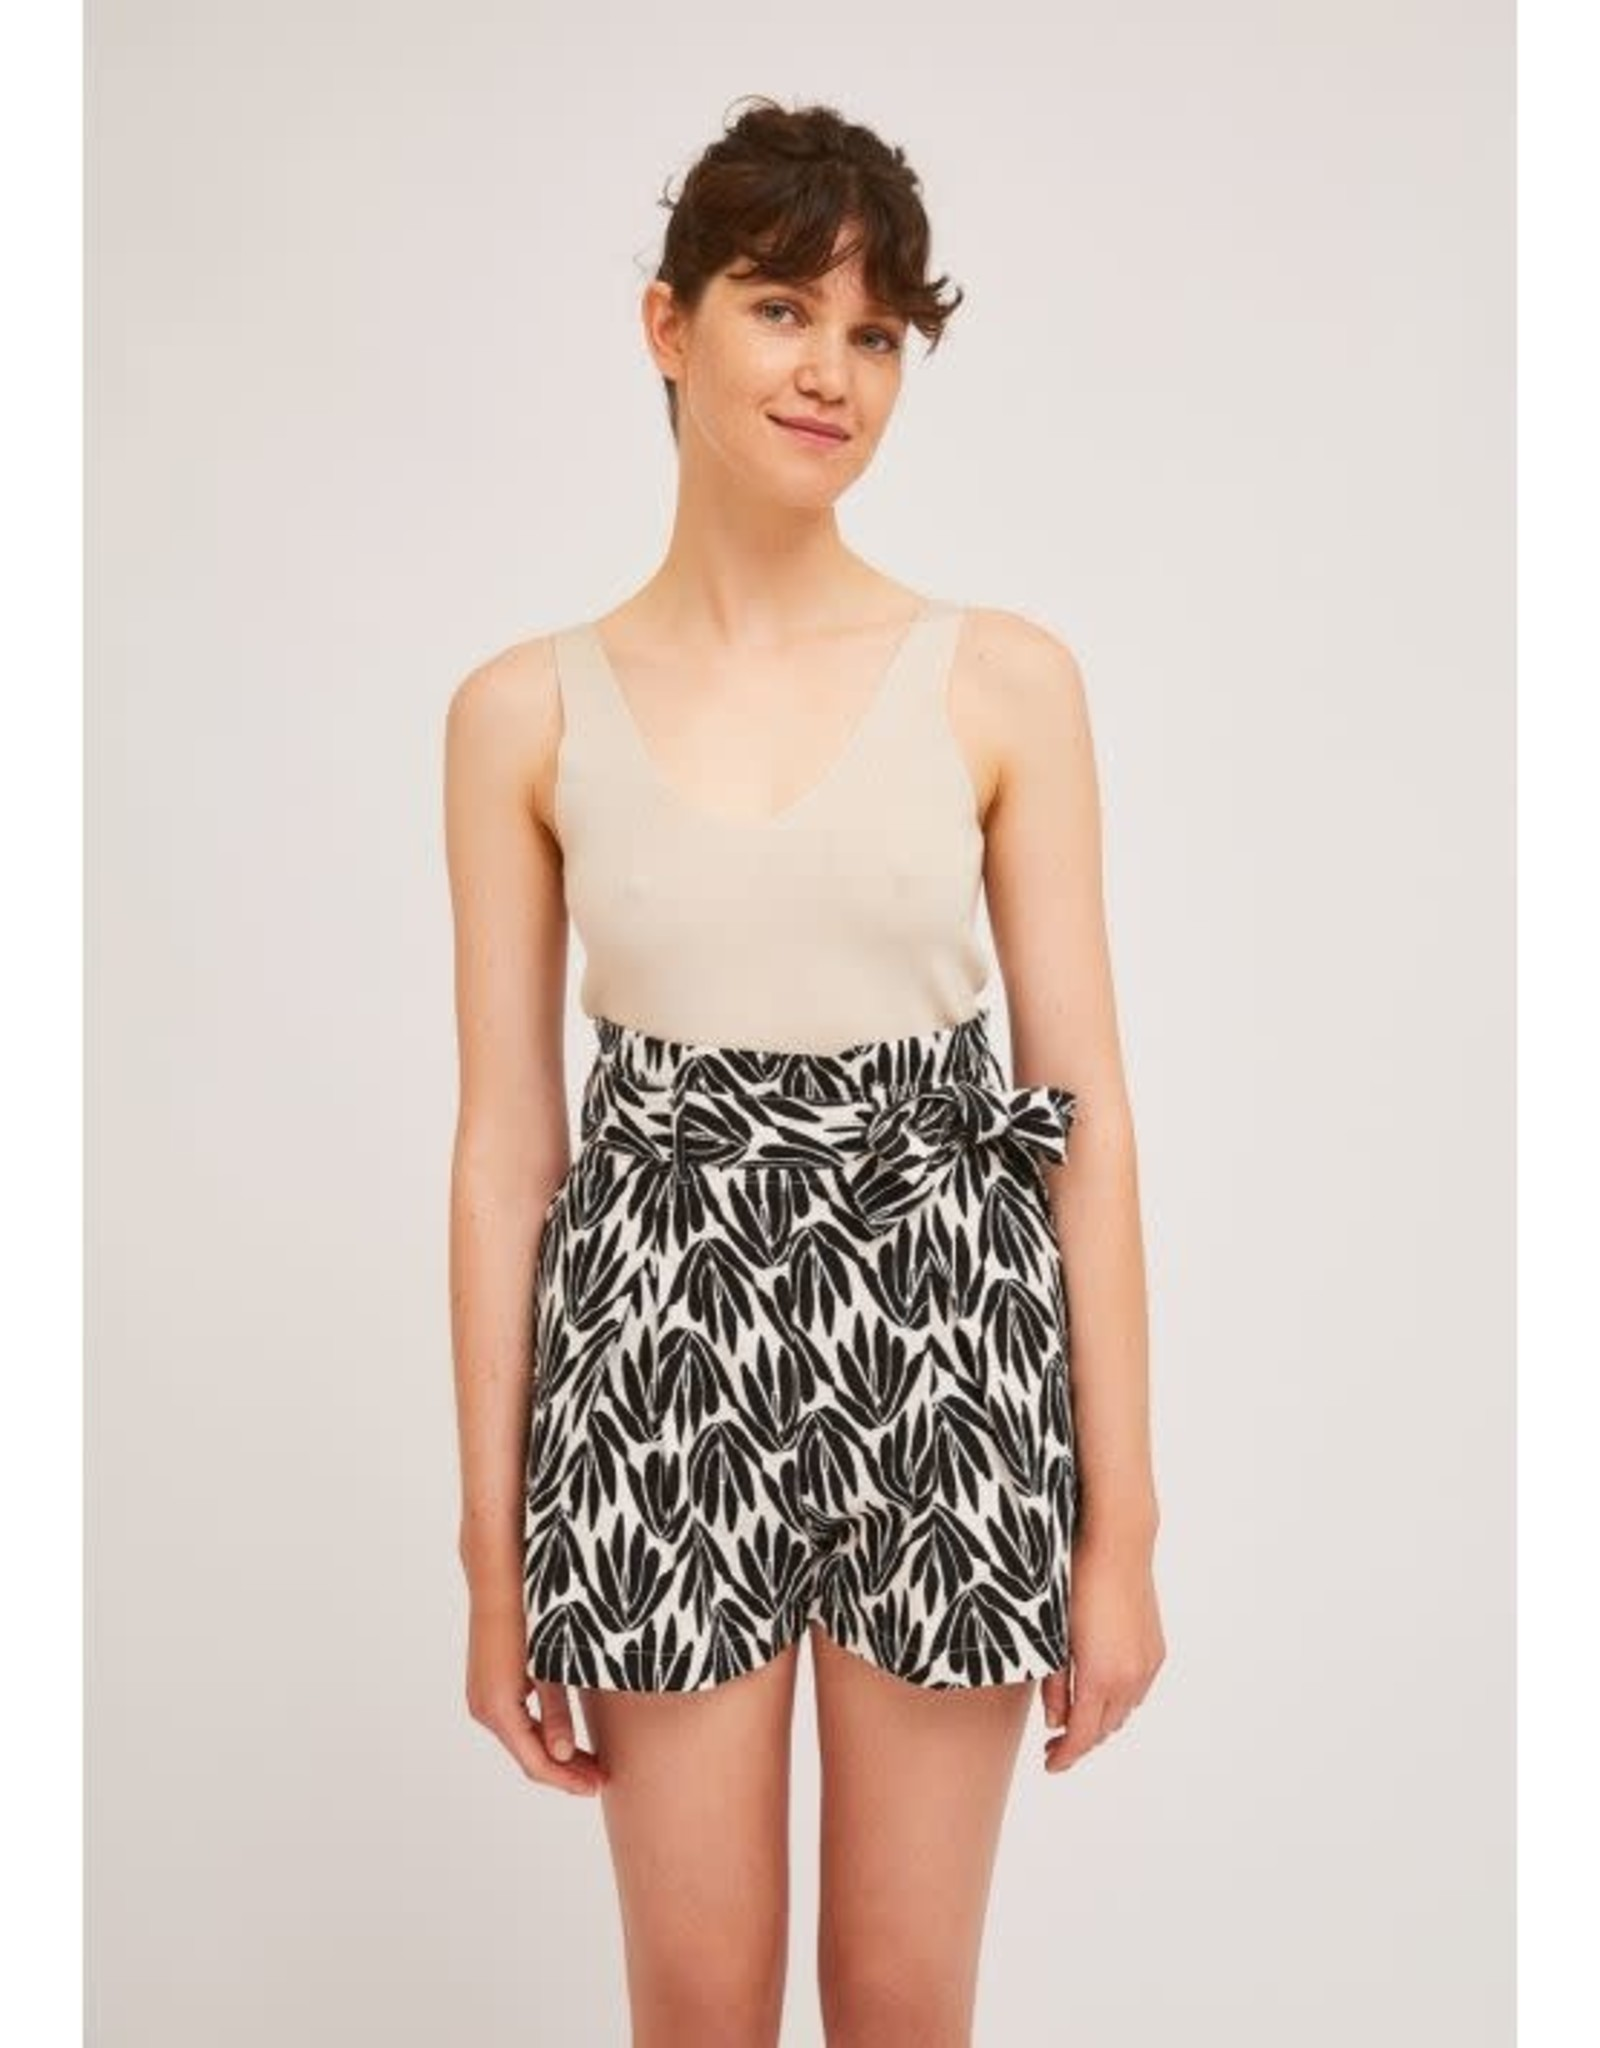 Compania Fantastica Compania Fantastica - Palm print shorts